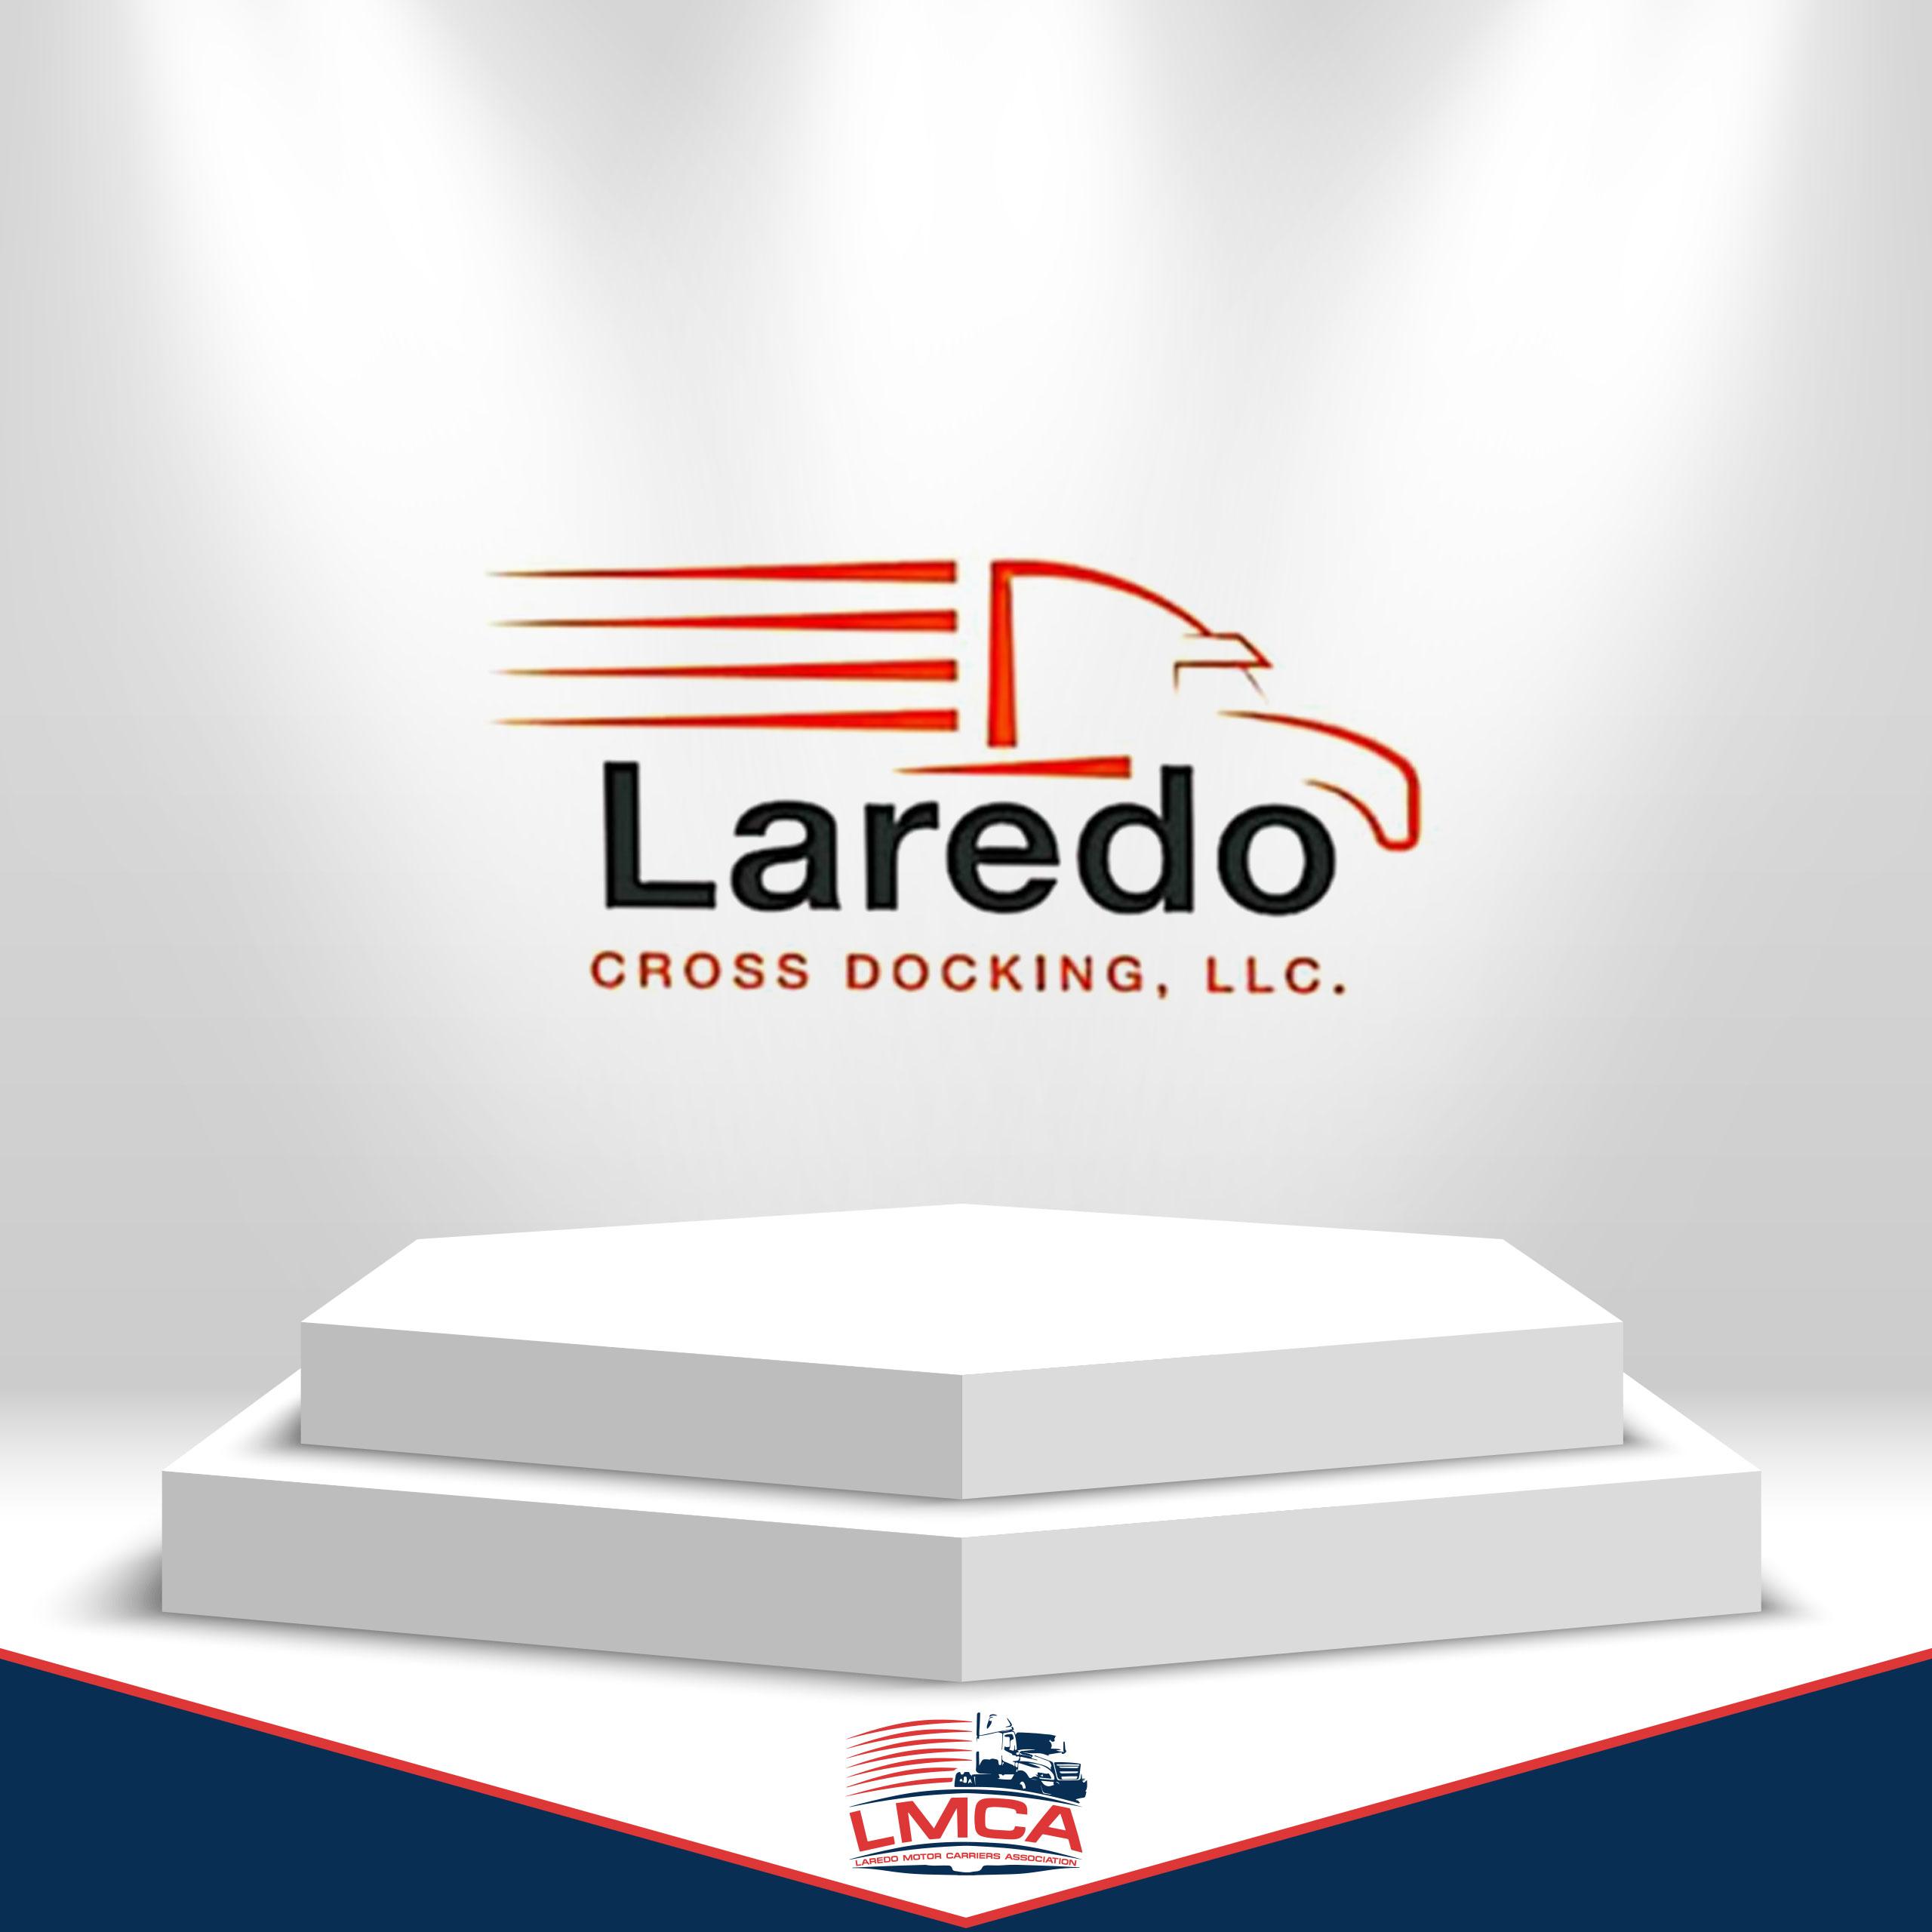 laredo-cross-docking